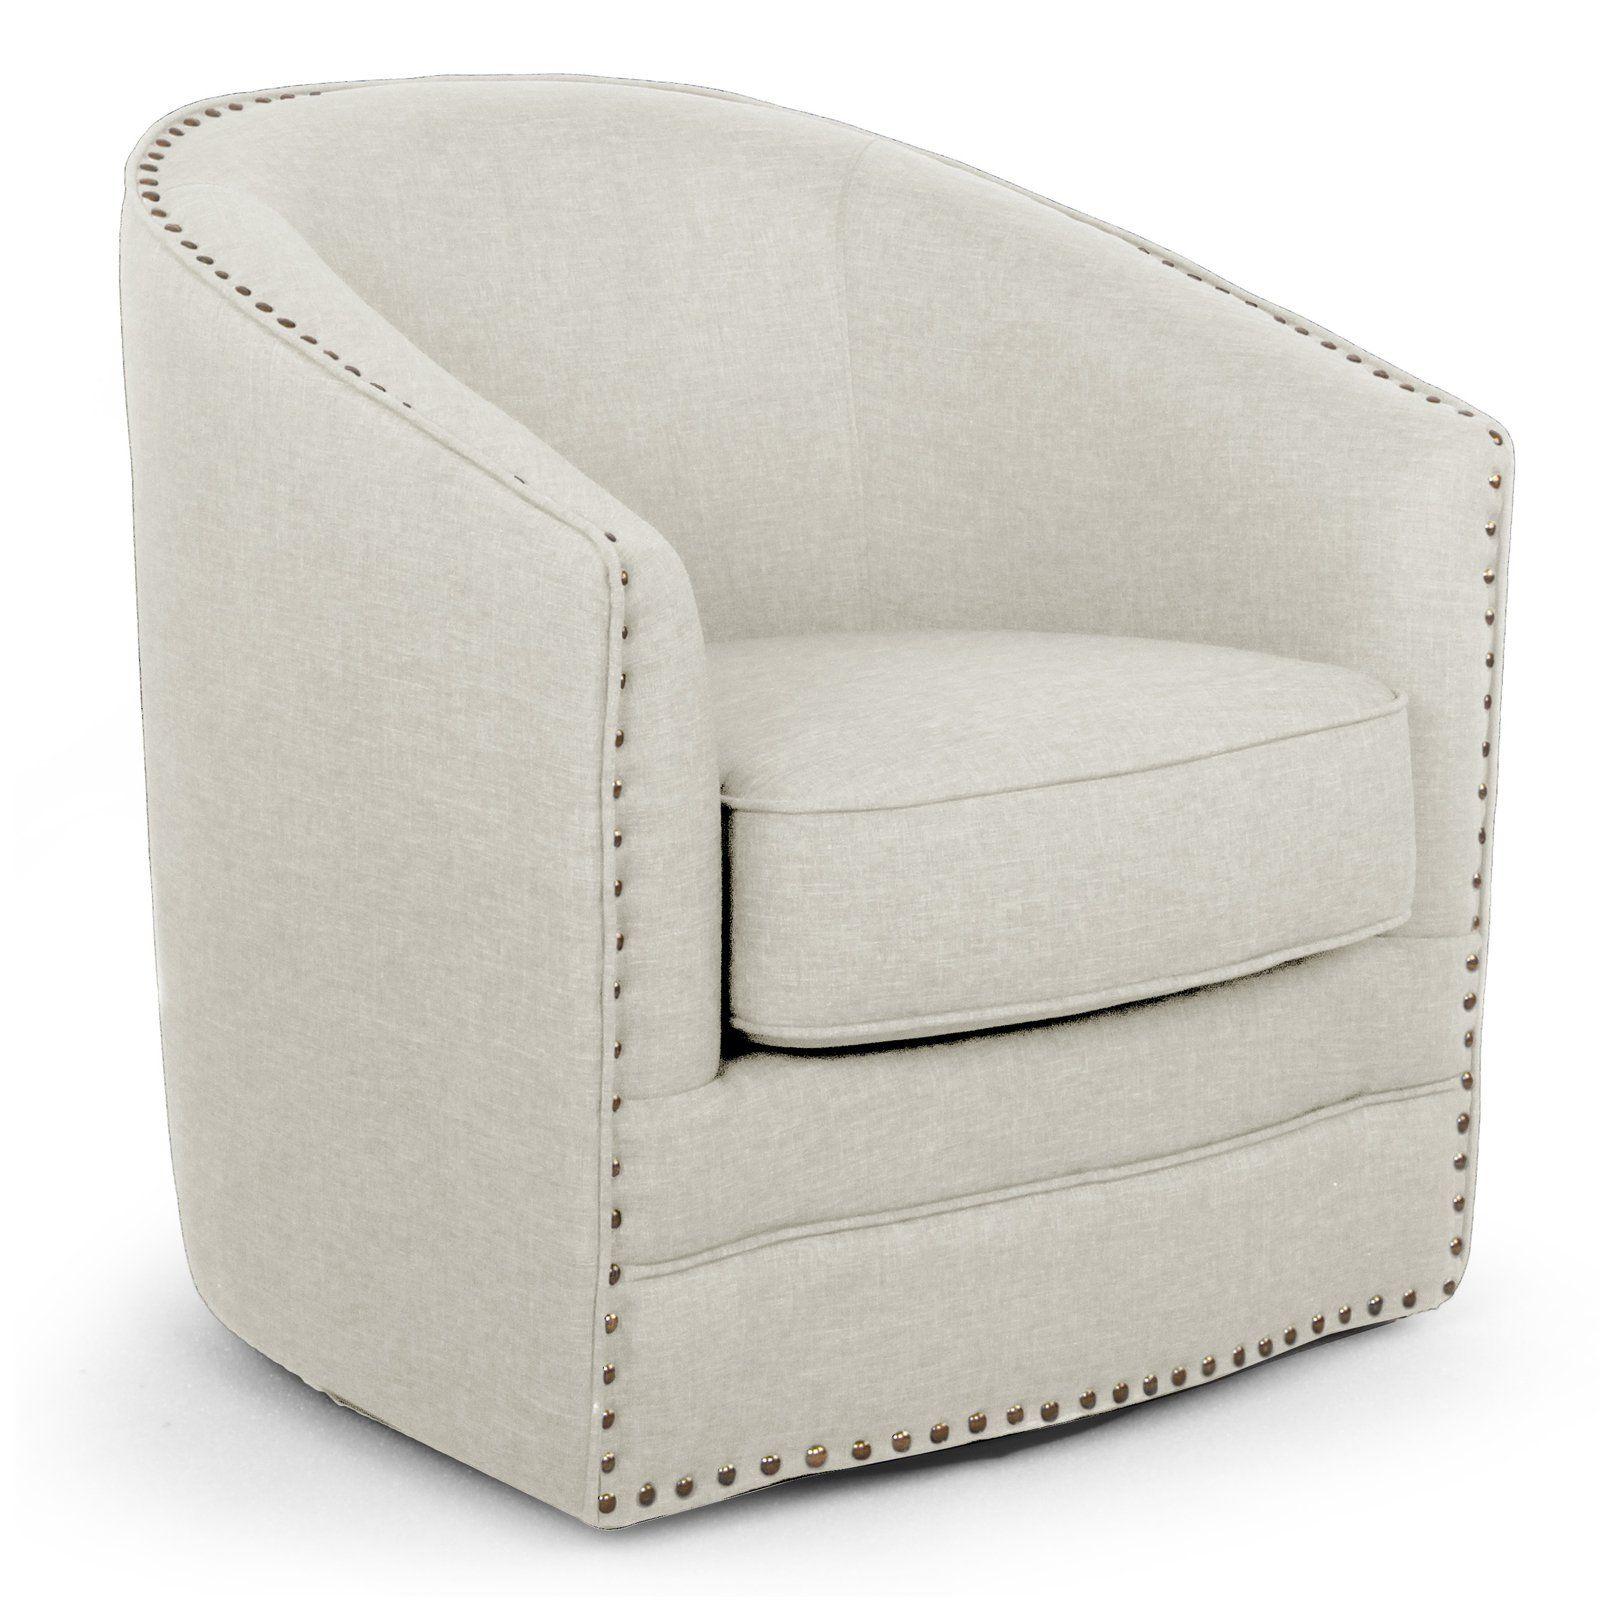 Baxton Studio Porter Barrel Chair from